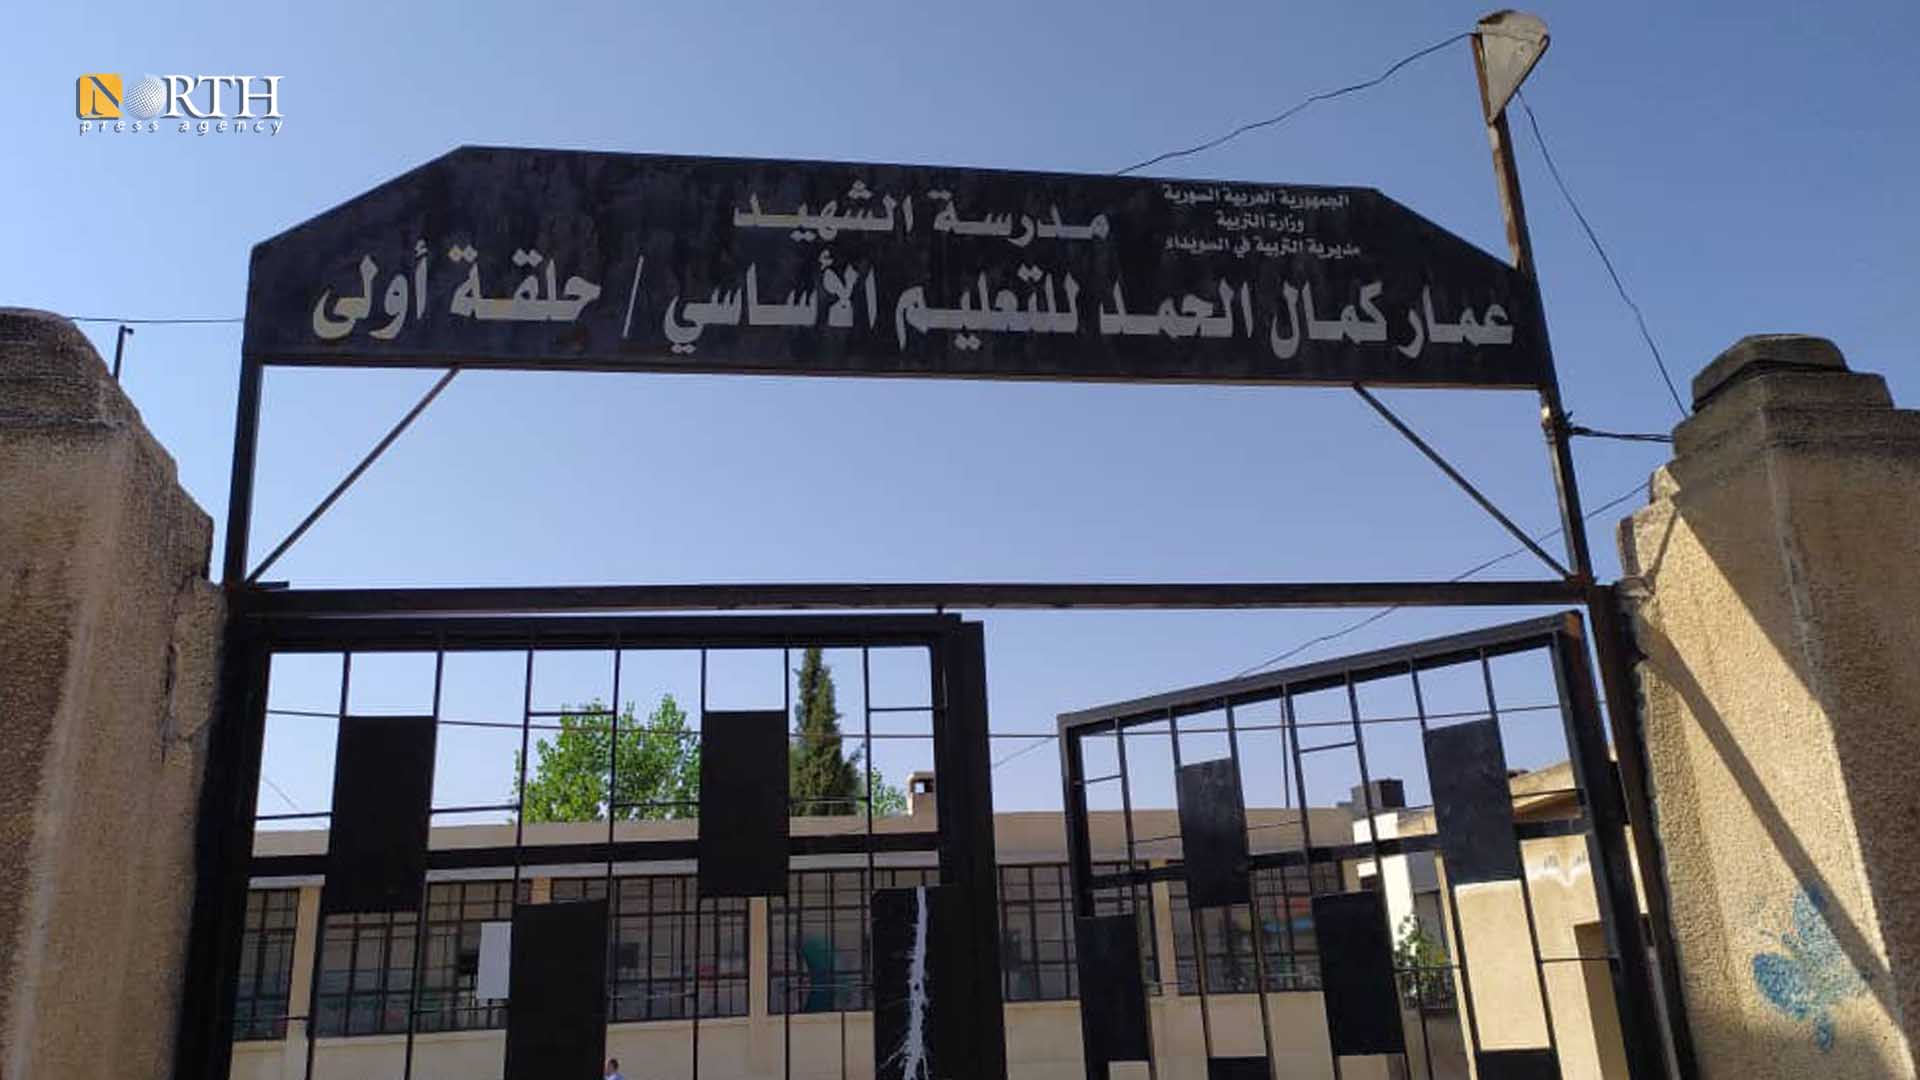 Ammar Kamal al-Hamad Elementary School in the city of Suwayda – North Press